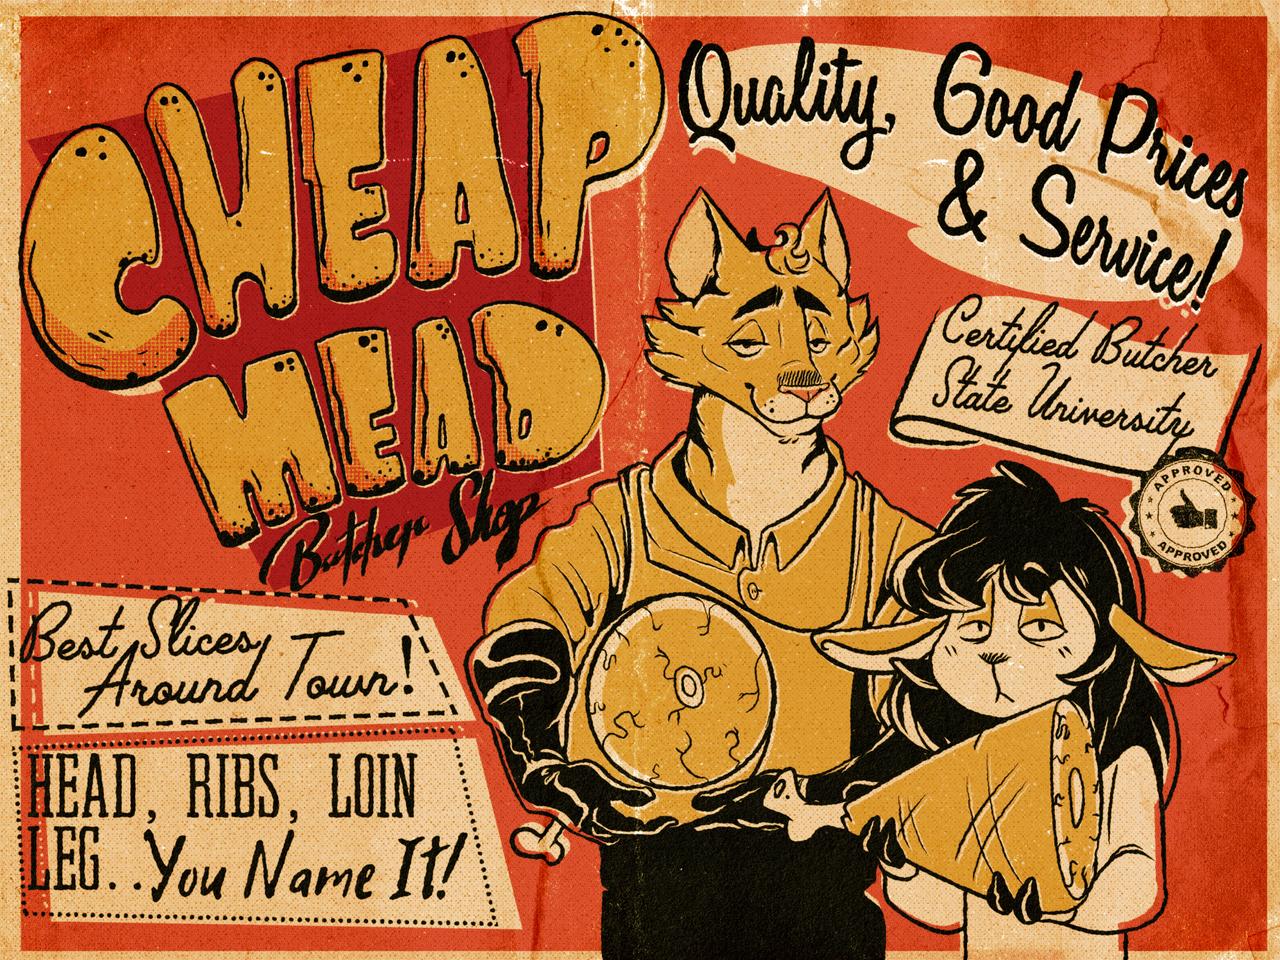 HIENA COM!: Cheap Mead!